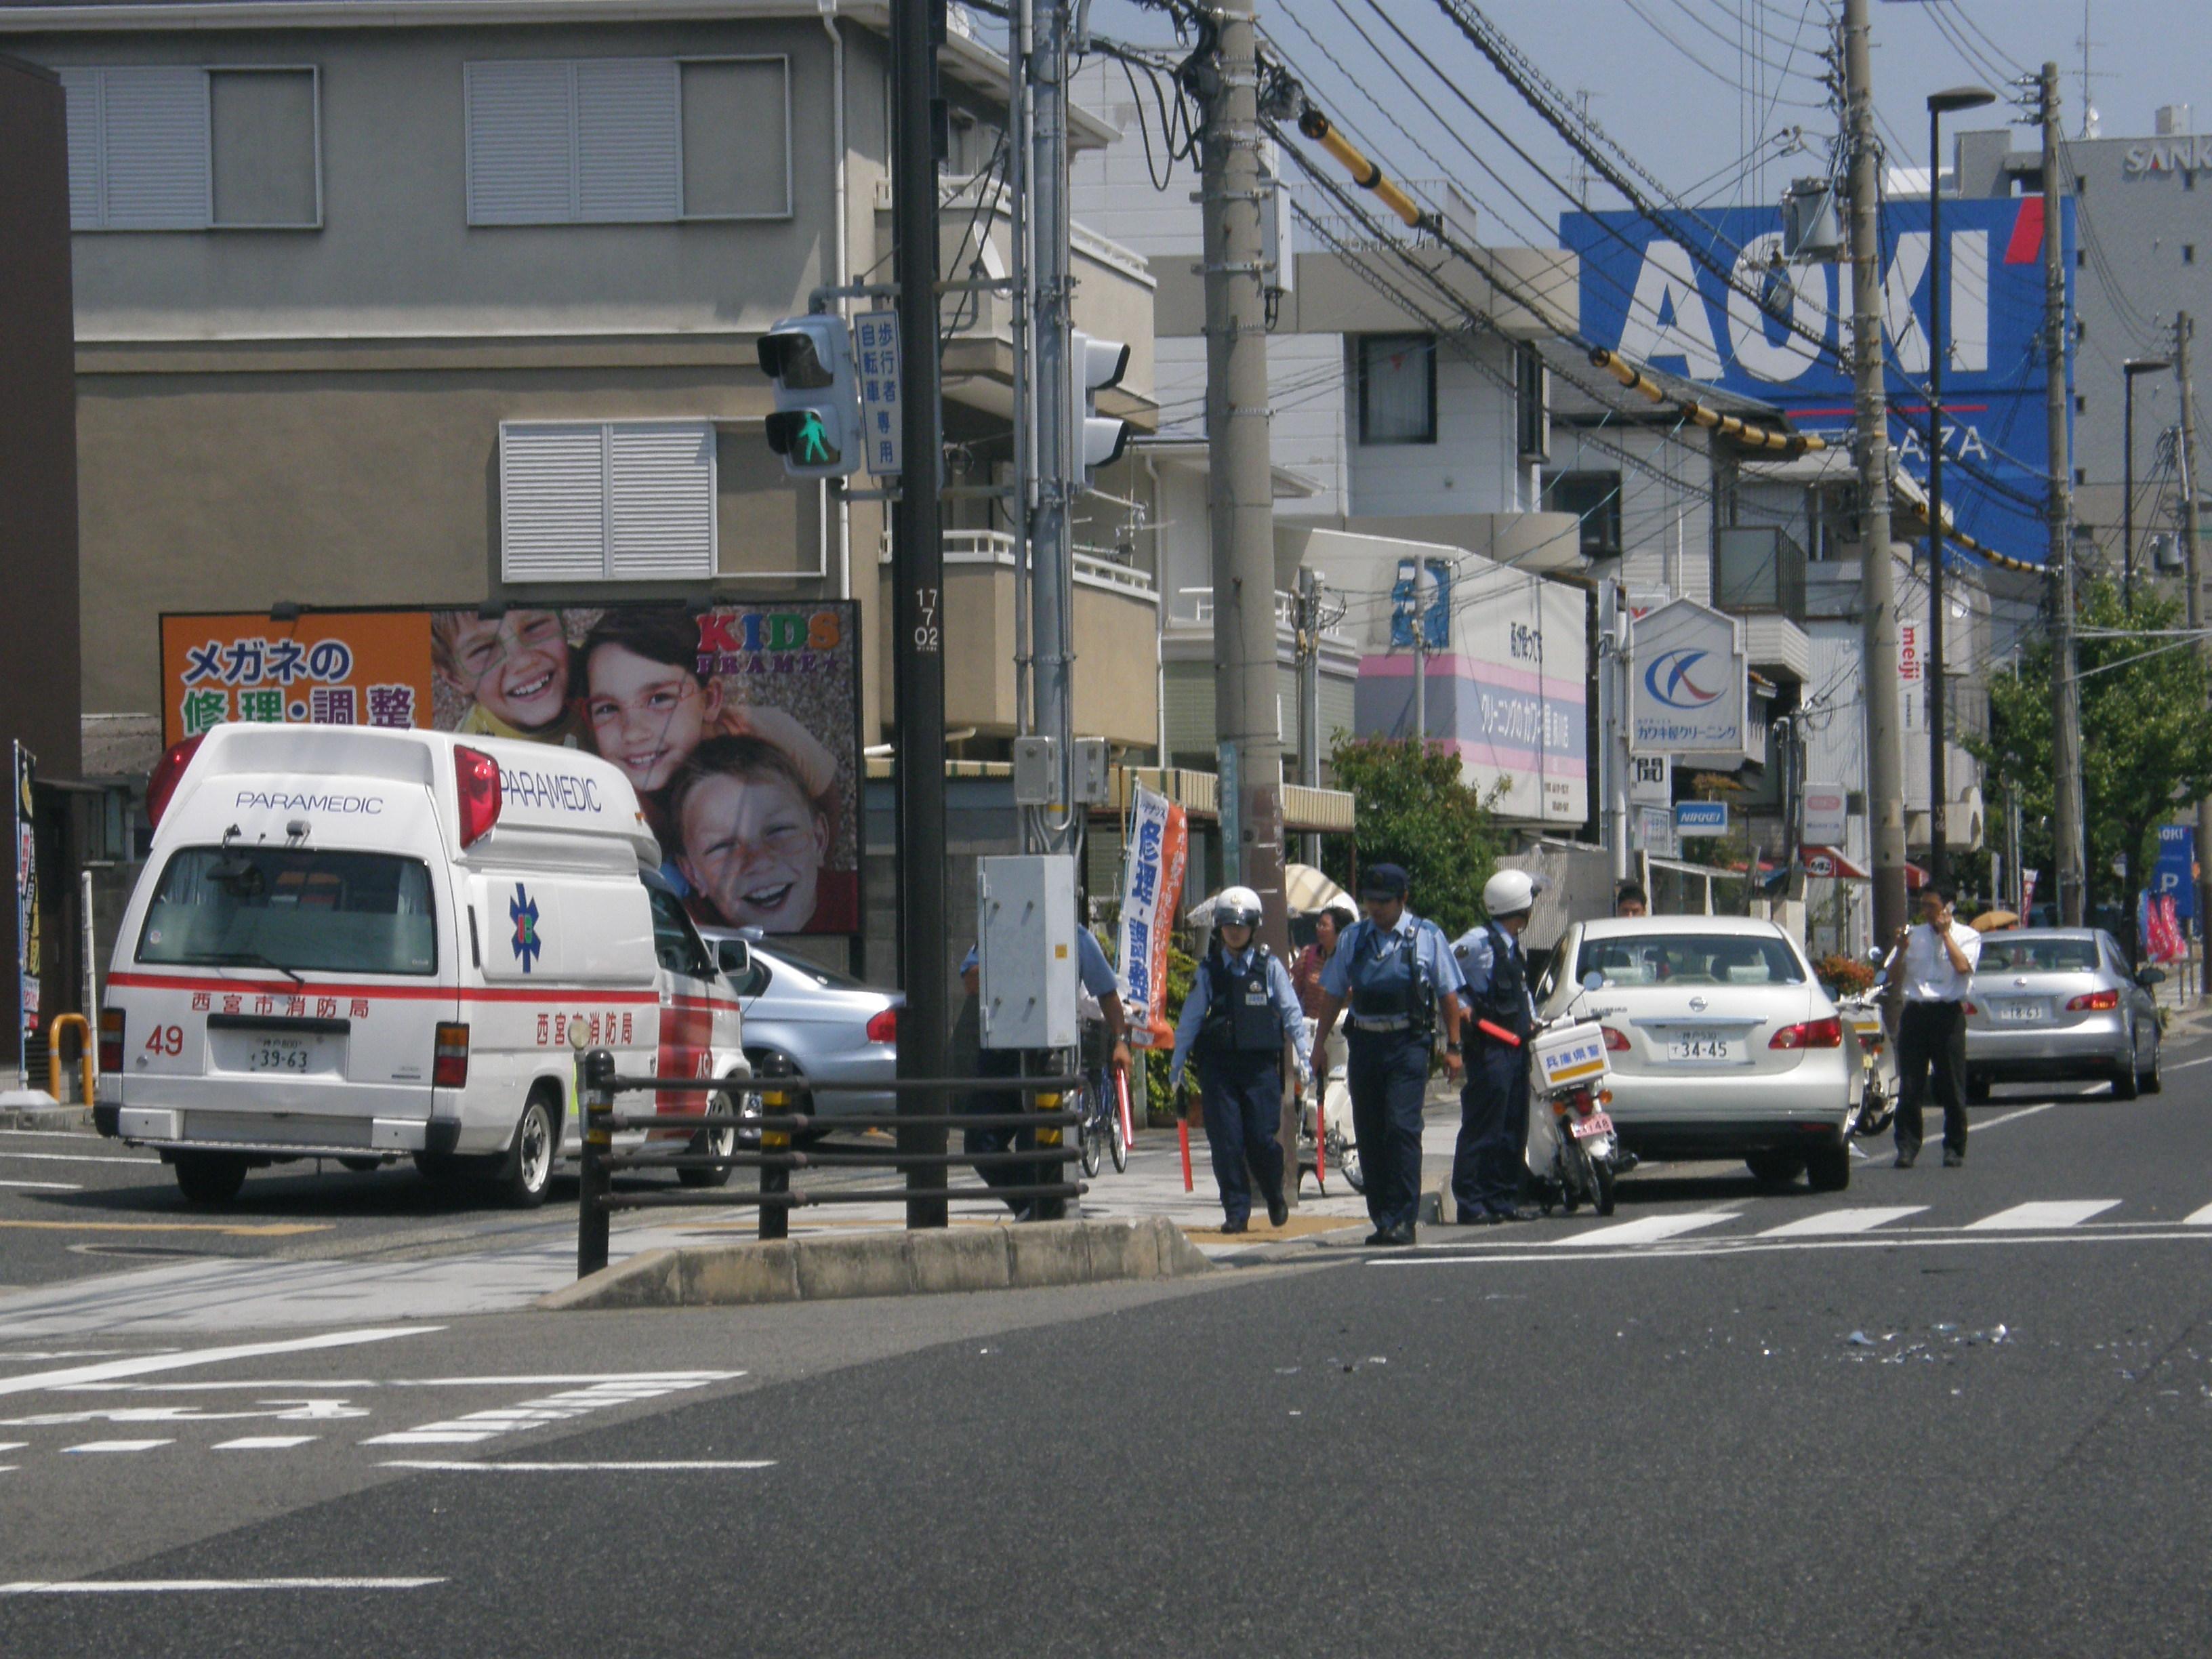 Traffic collision Nishinomiya, Hyogo 交通事故(西宮市).jpg